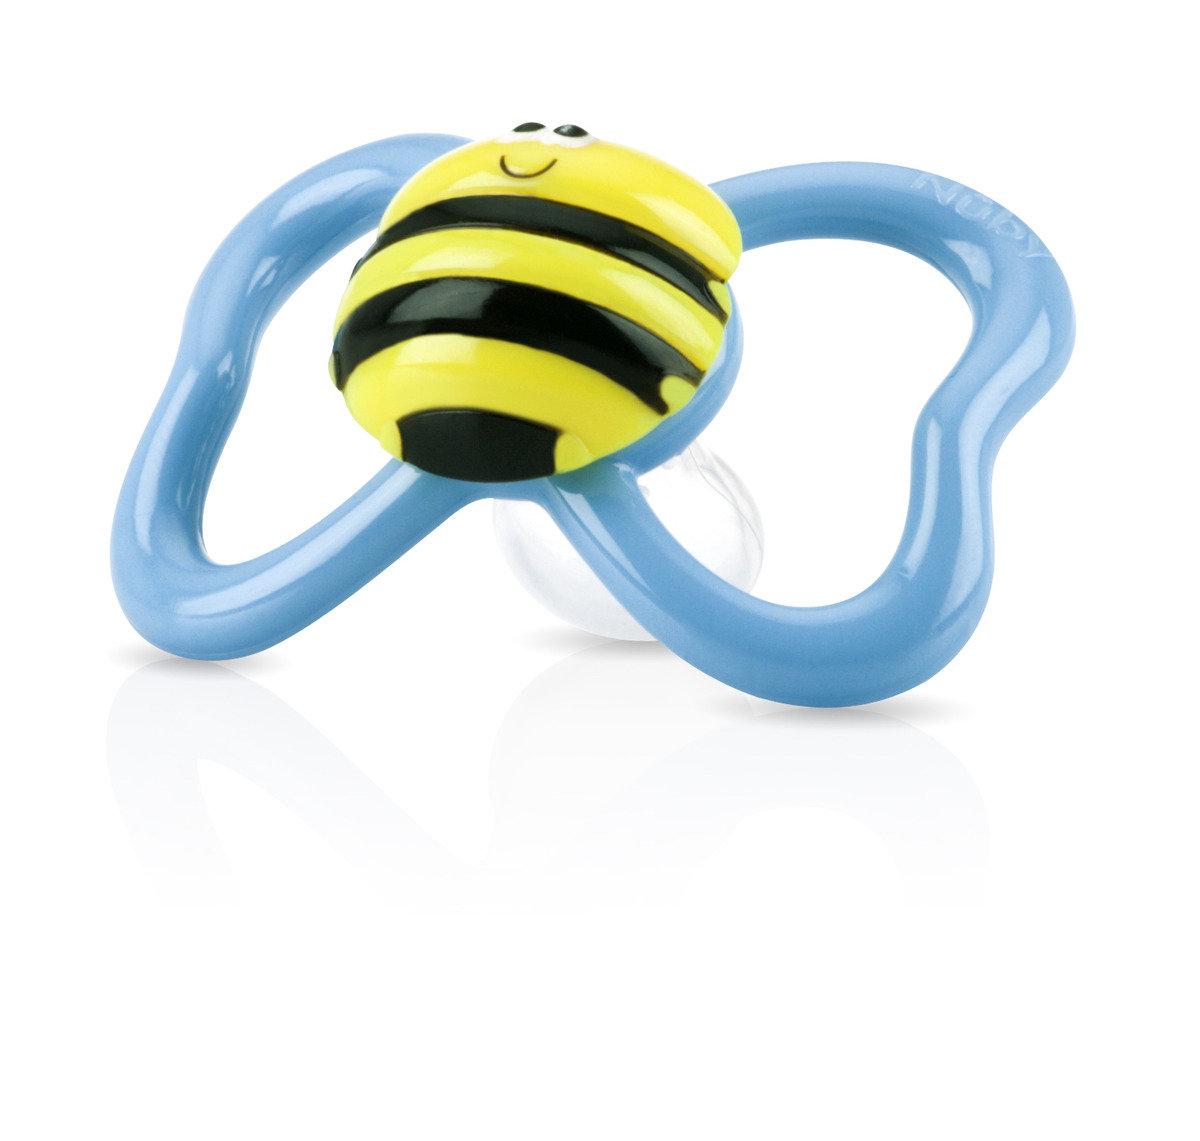 安撫奶嘴  - 蜜蜂